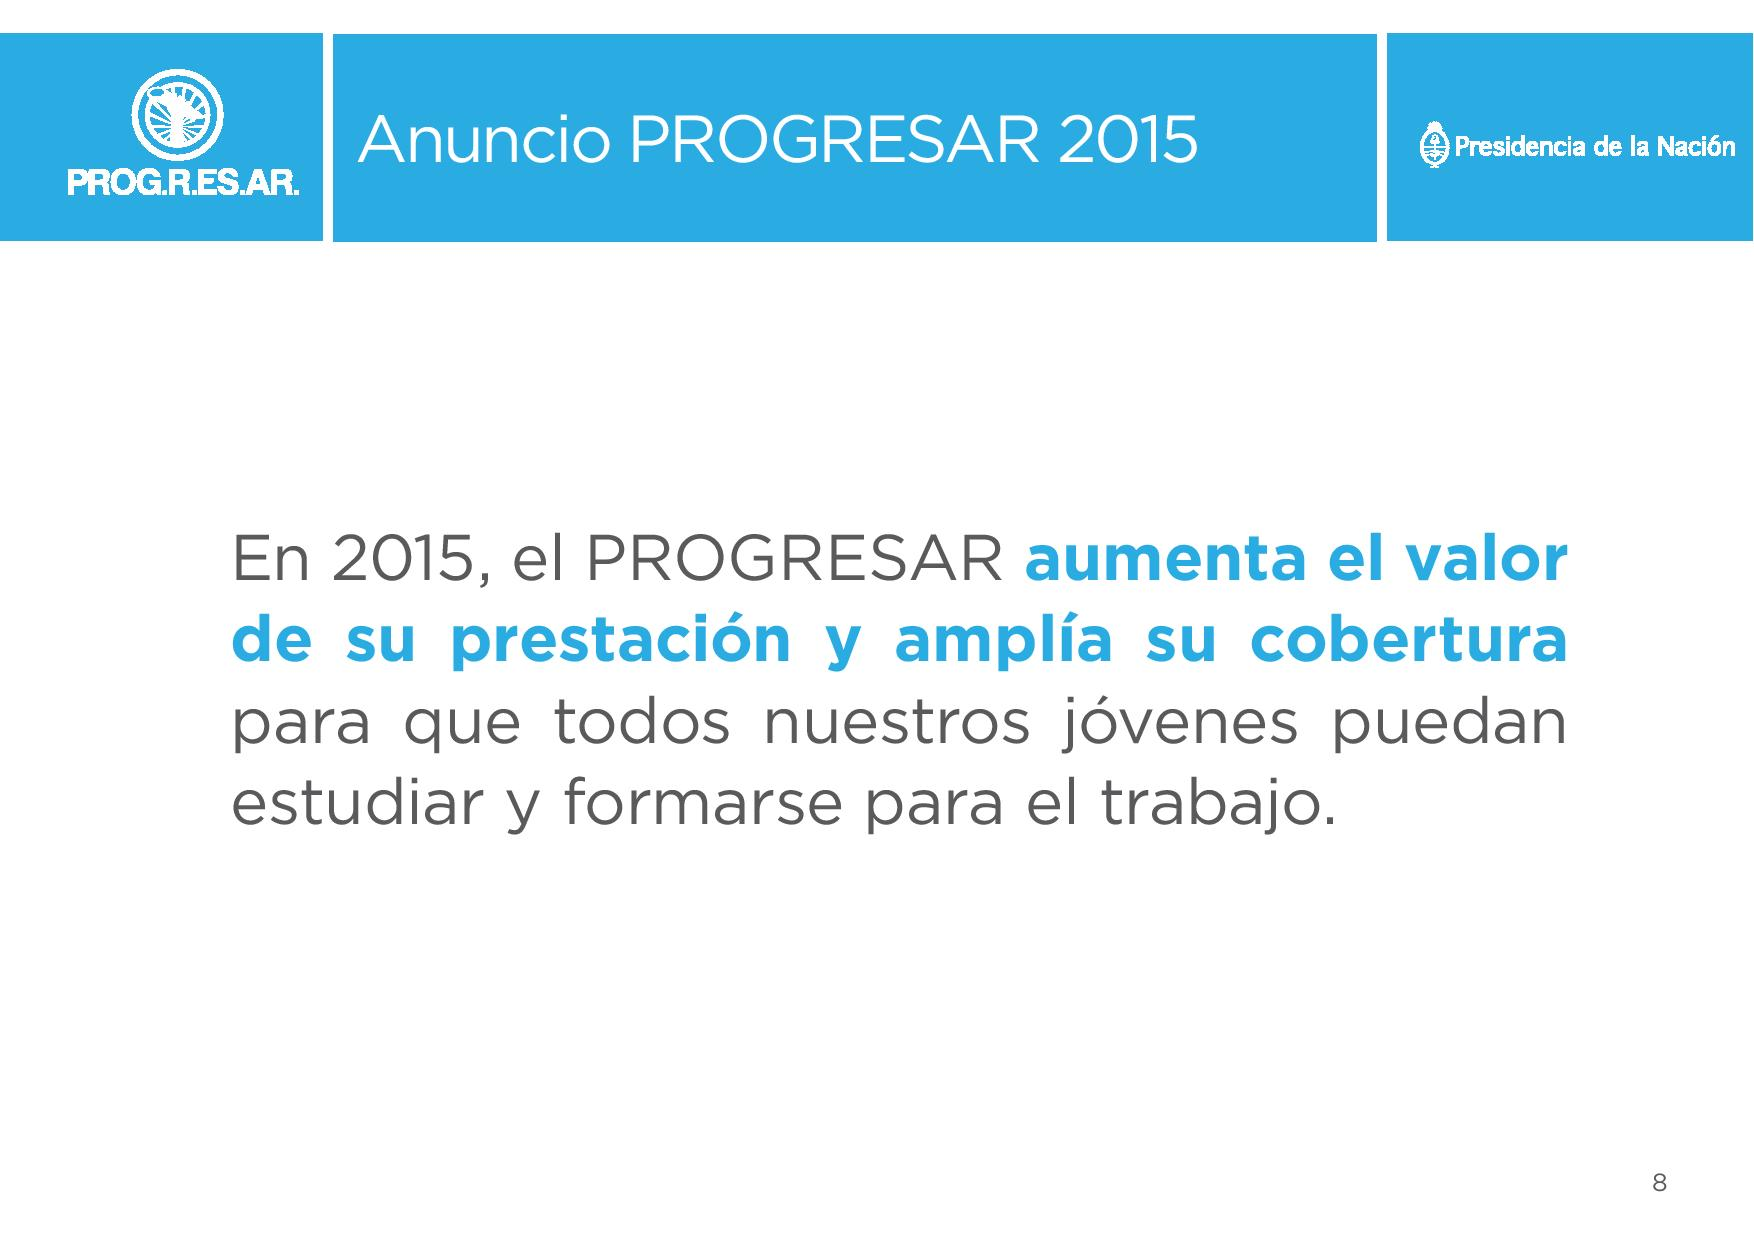 Profundizacion_Febrero 2015_FINAL (BAJA) FINAL-page-008